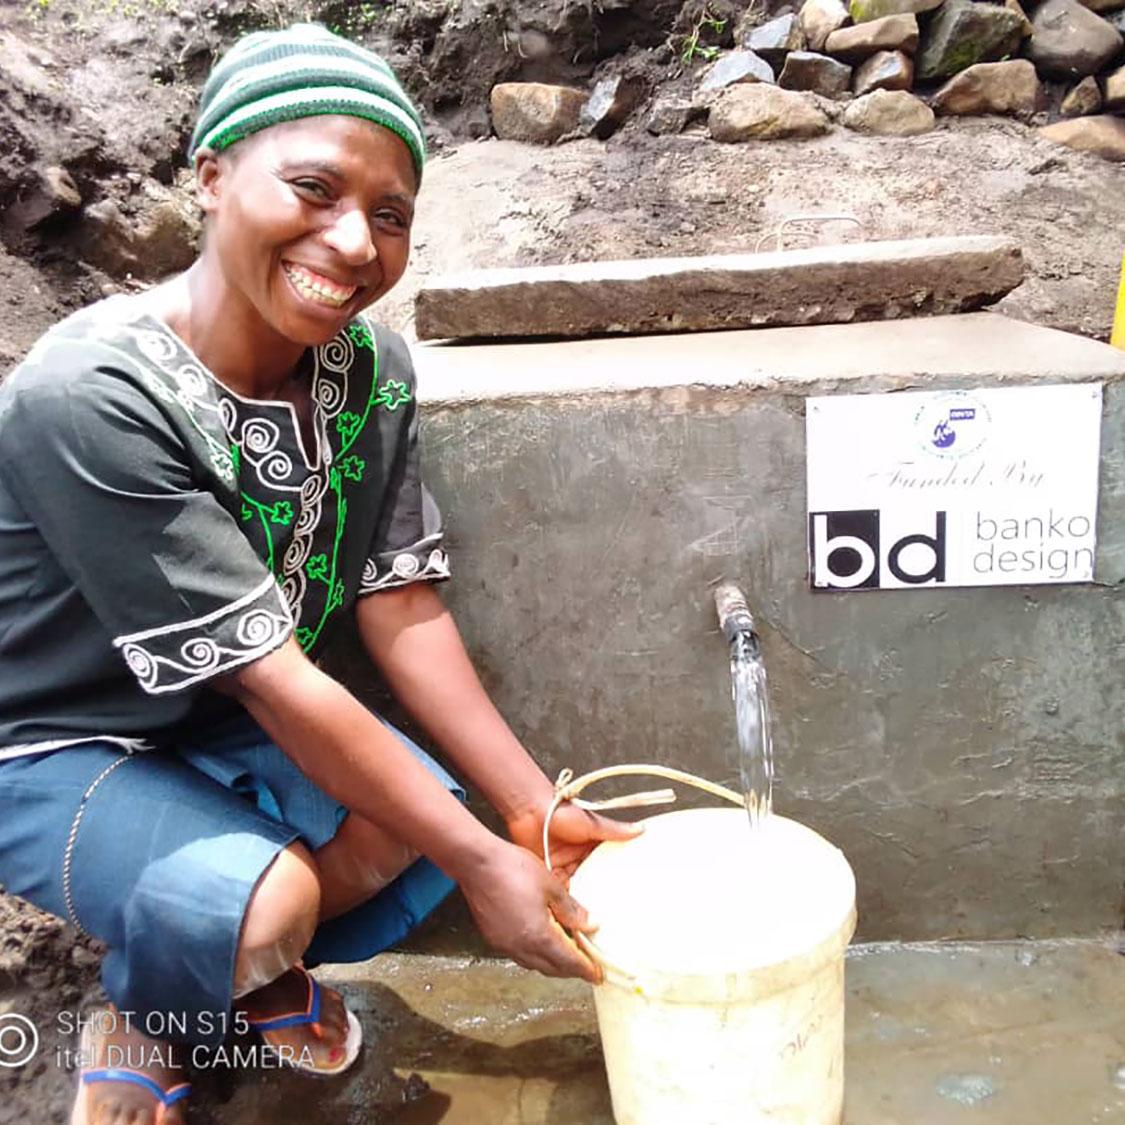 cdvta-banko-water-project